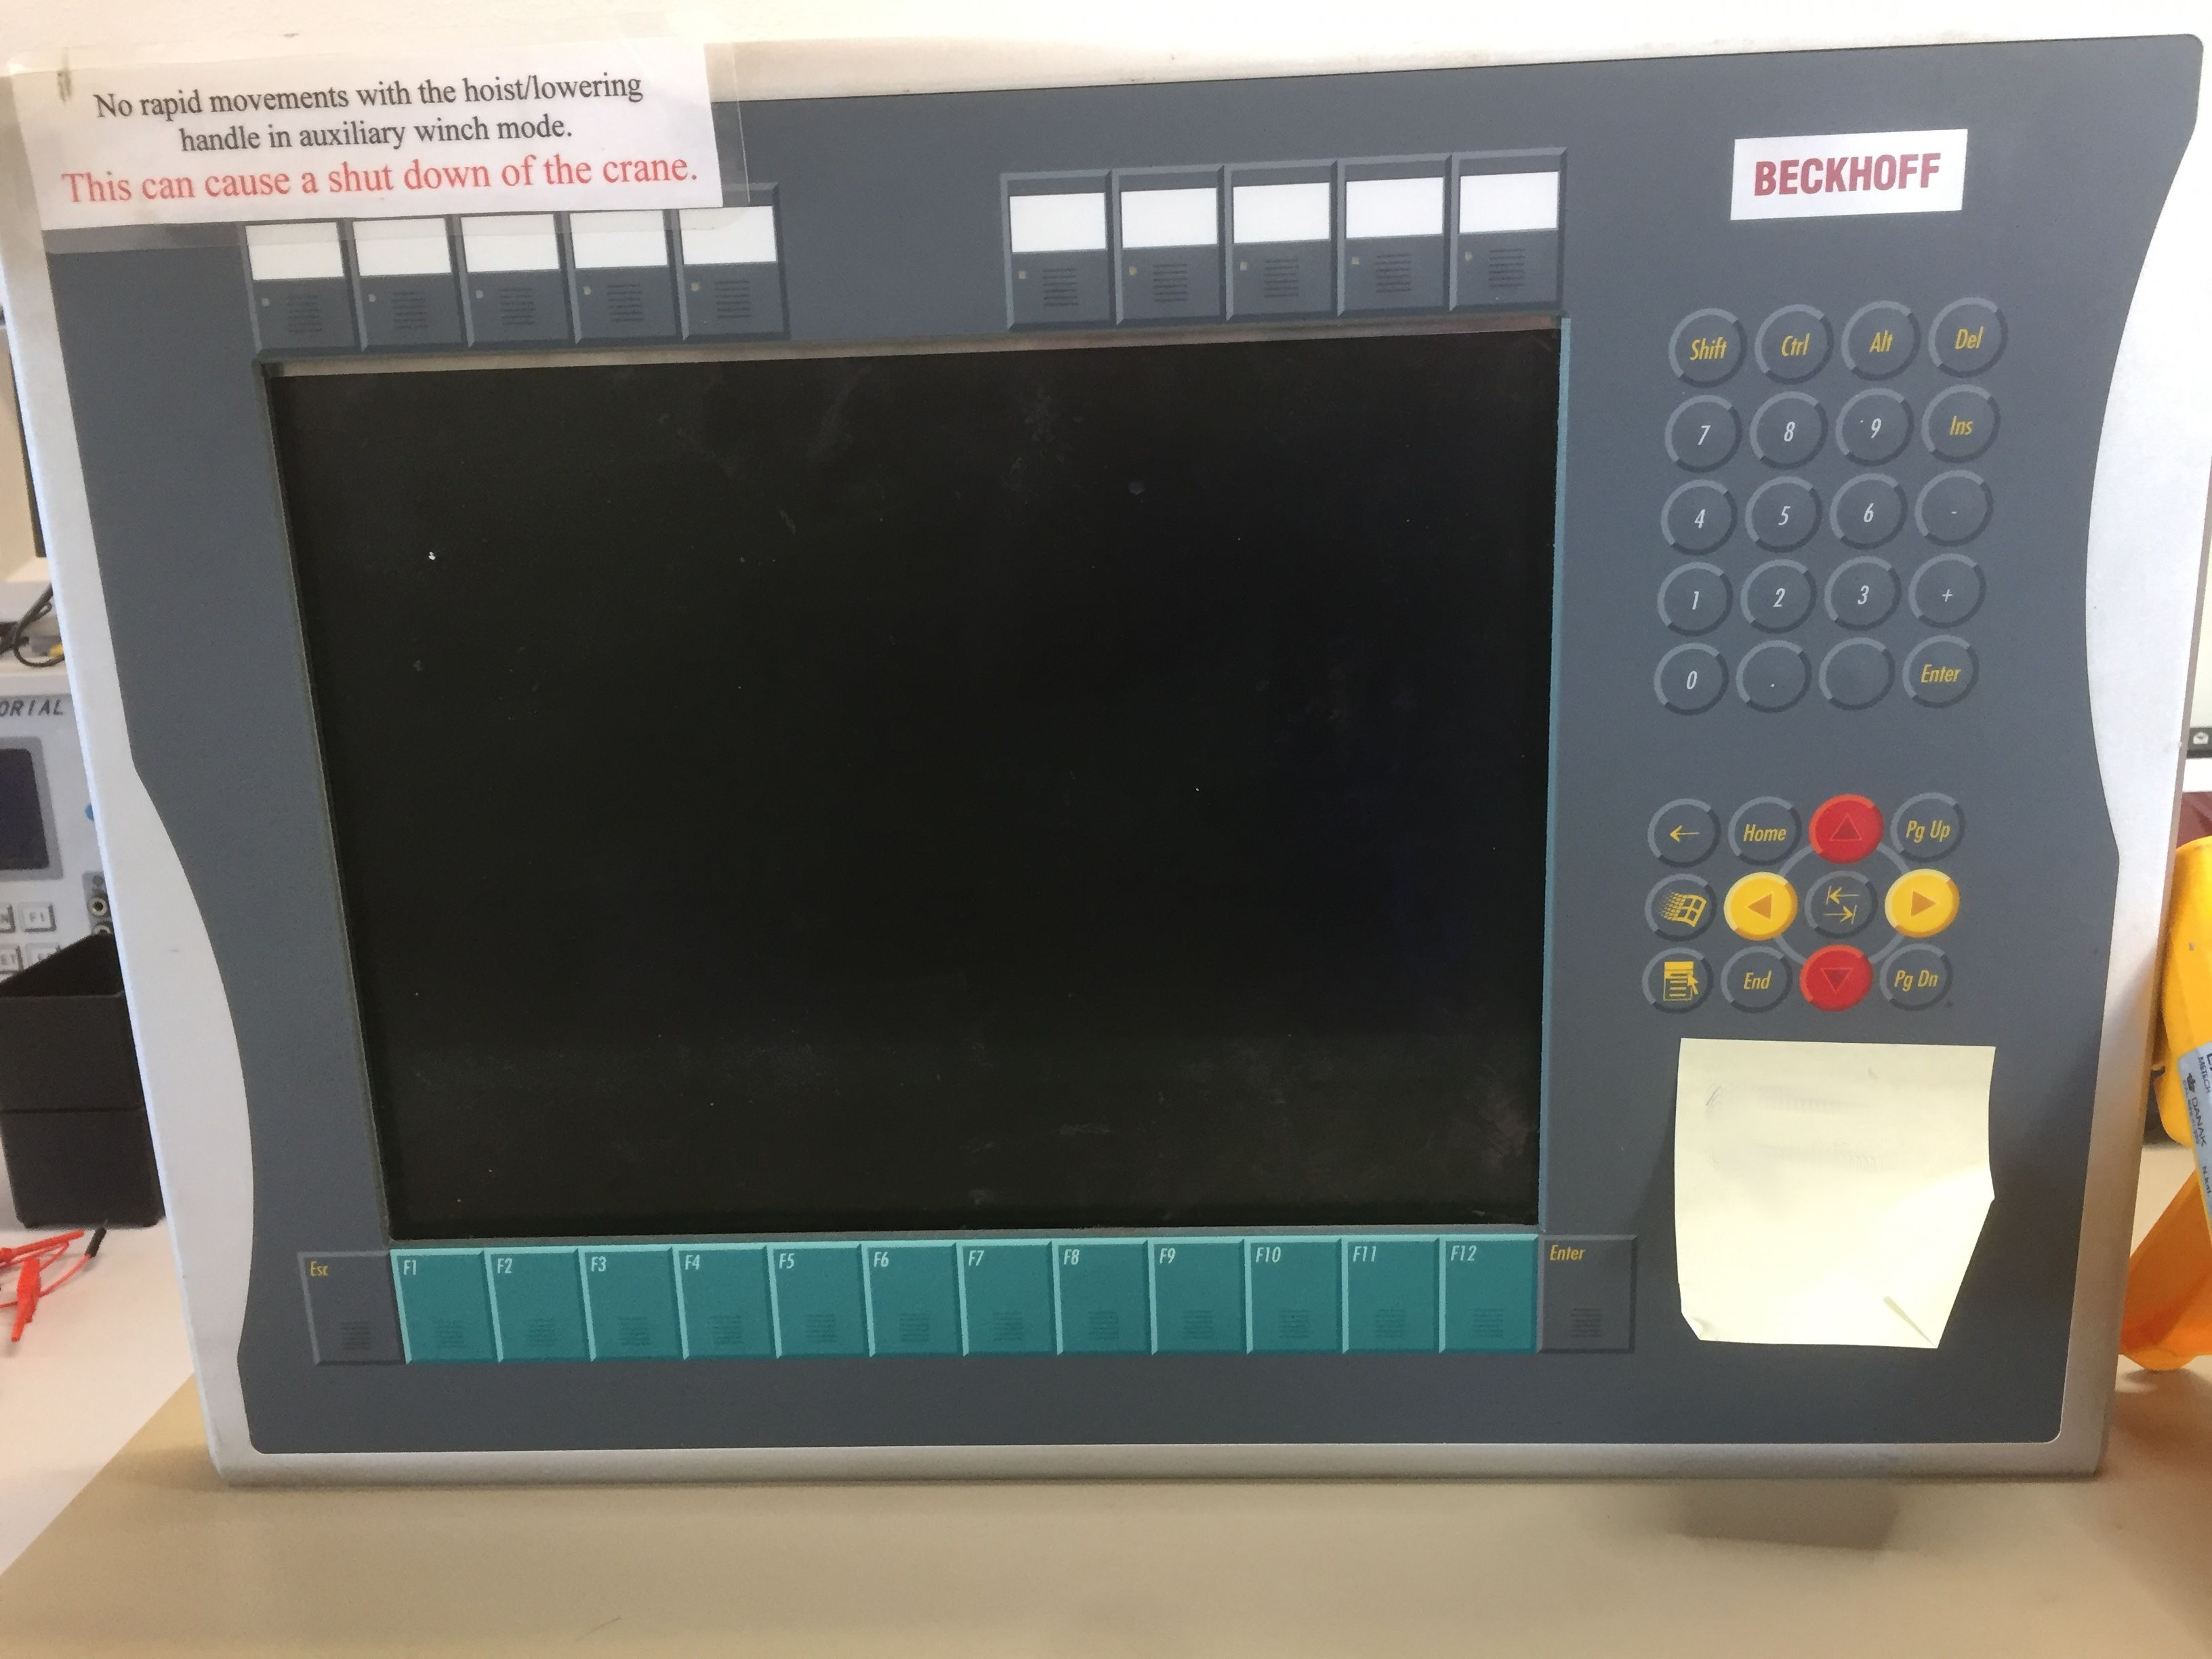 Control panel for crane